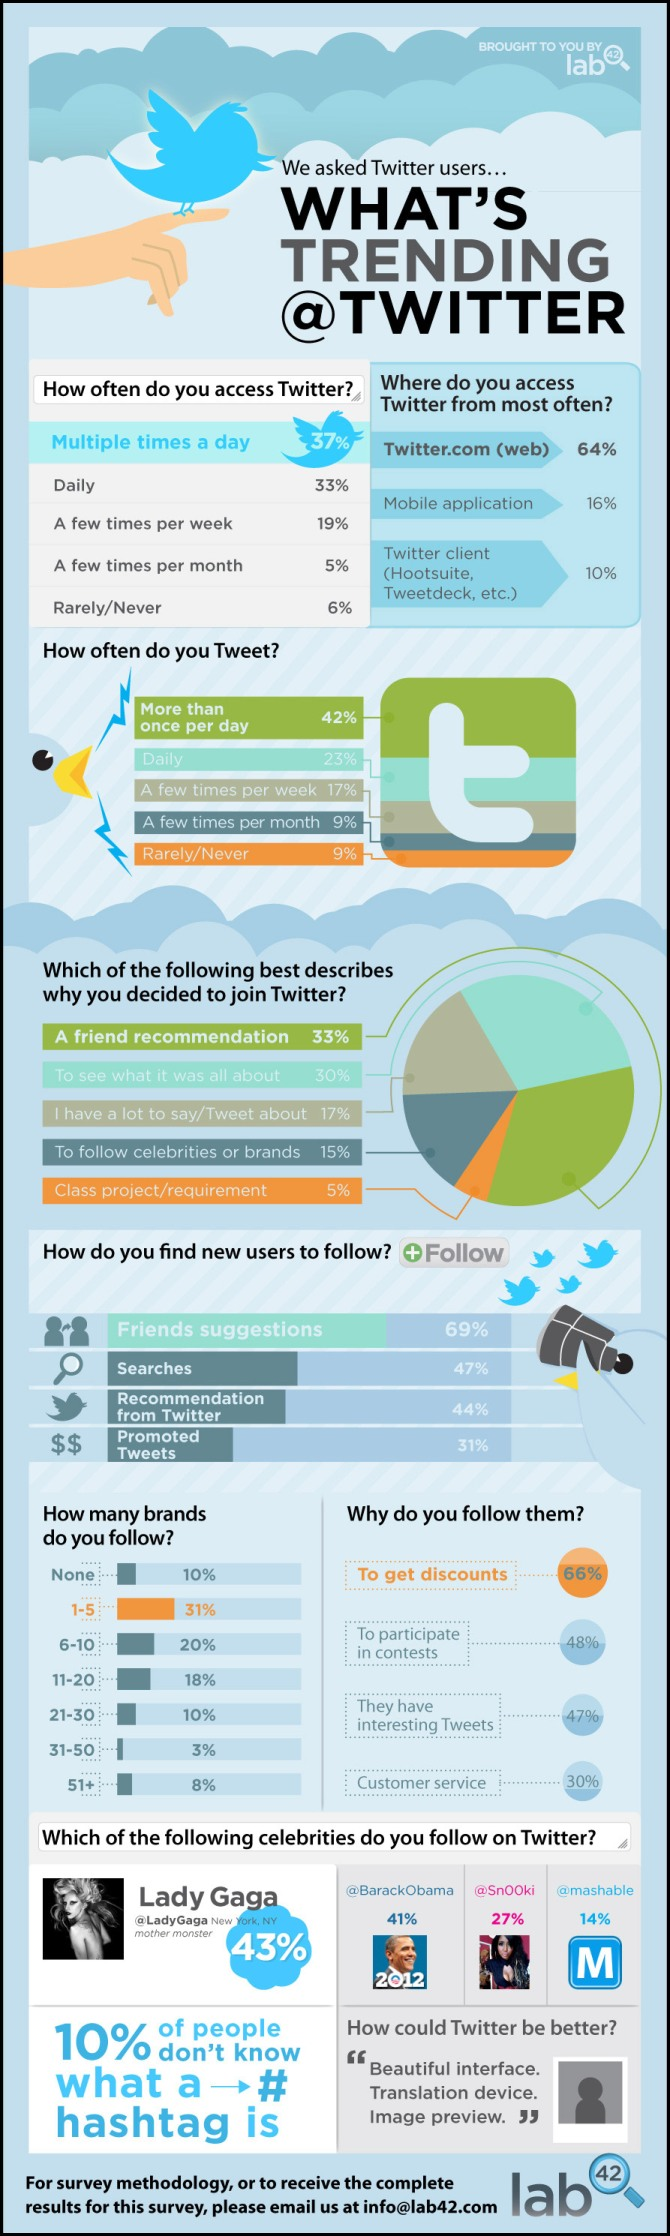 ¿Cómo usamos Twitter?